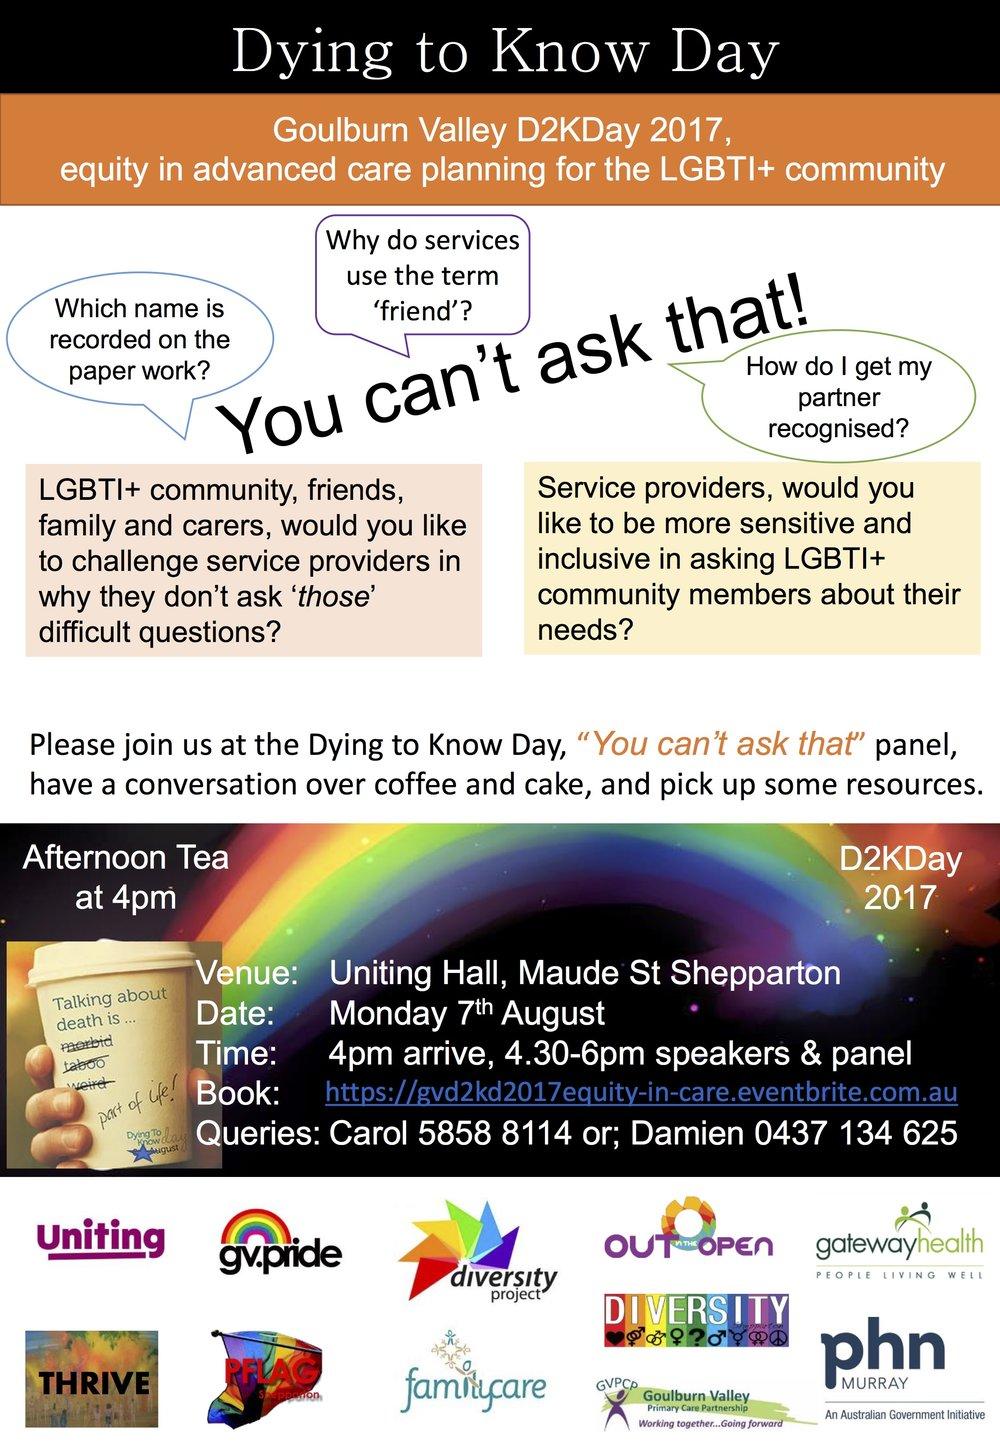 LGBTI Health Equity D2KDay Event Flyer 2017.jpg